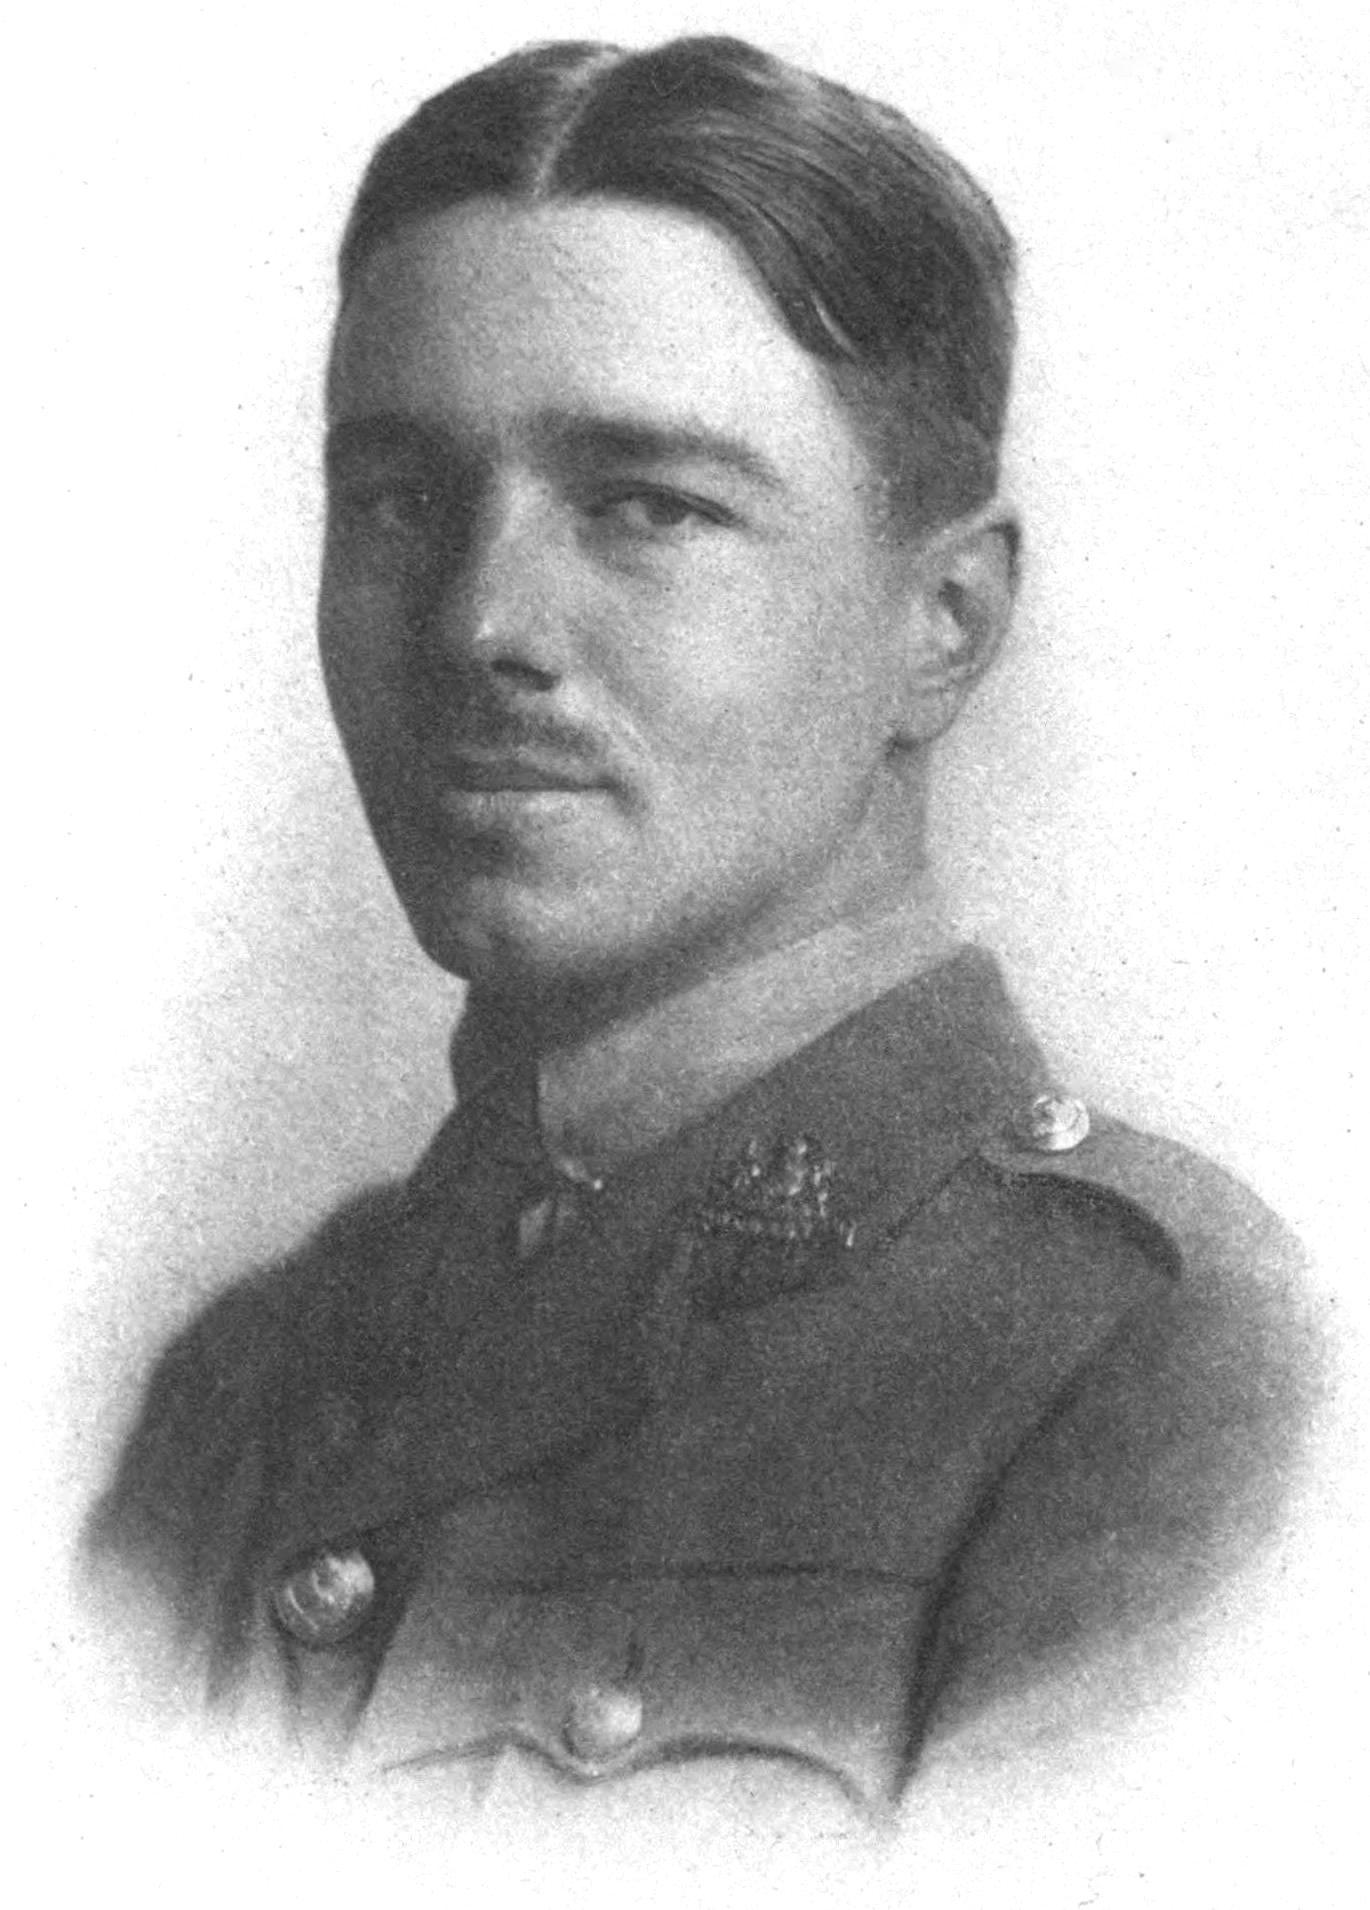 https://i1.wp.com/upload.wikimedia.org/wikipedia/commons/e/e3/Wilfred_Owen_plate_from_Poems_%281920%29.jpg